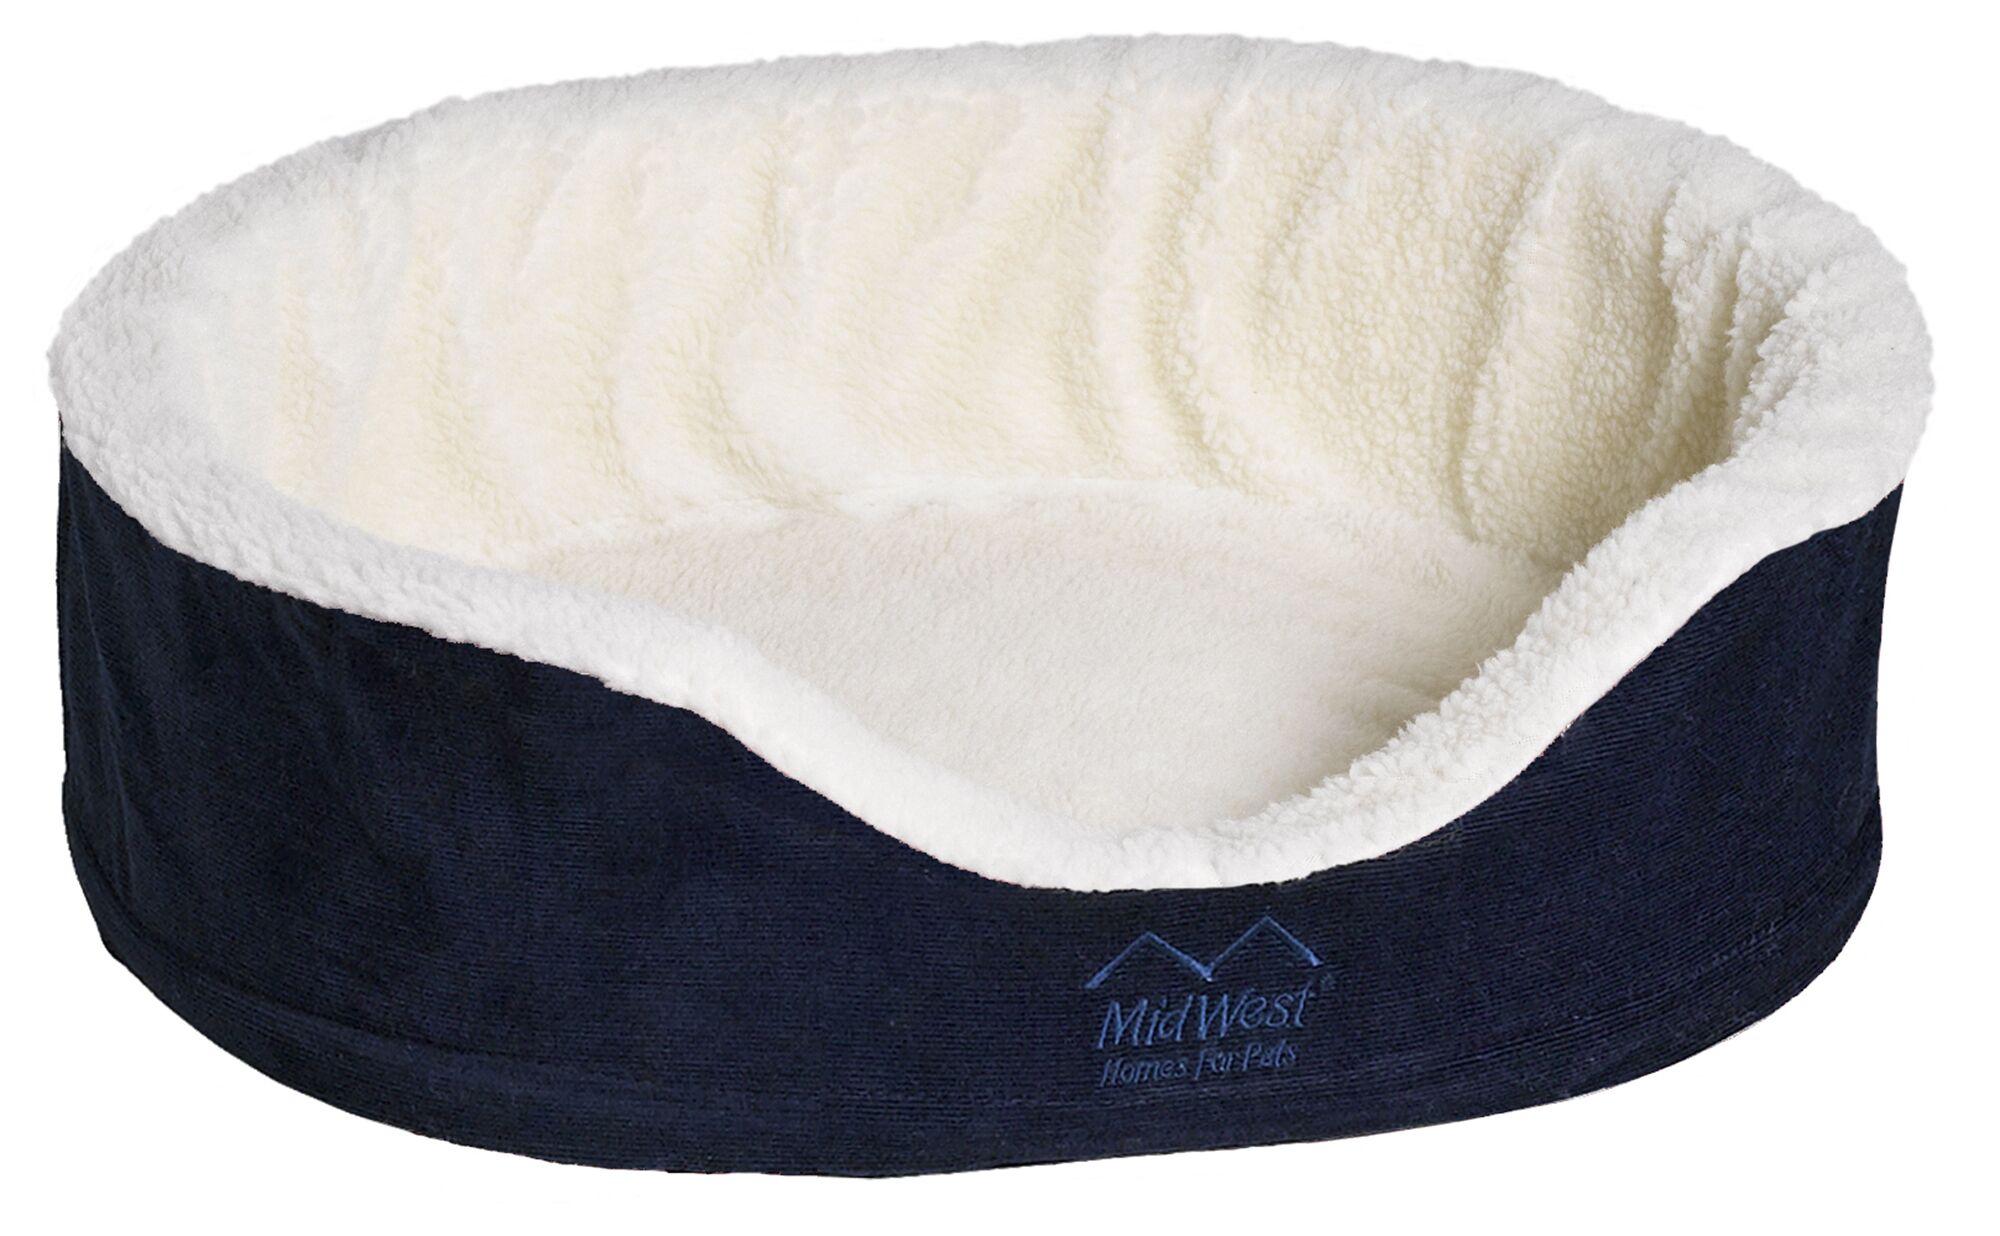 Quiet Time e'Sensuals Orthopedic Bolster Pet Bed Size: Medium (28